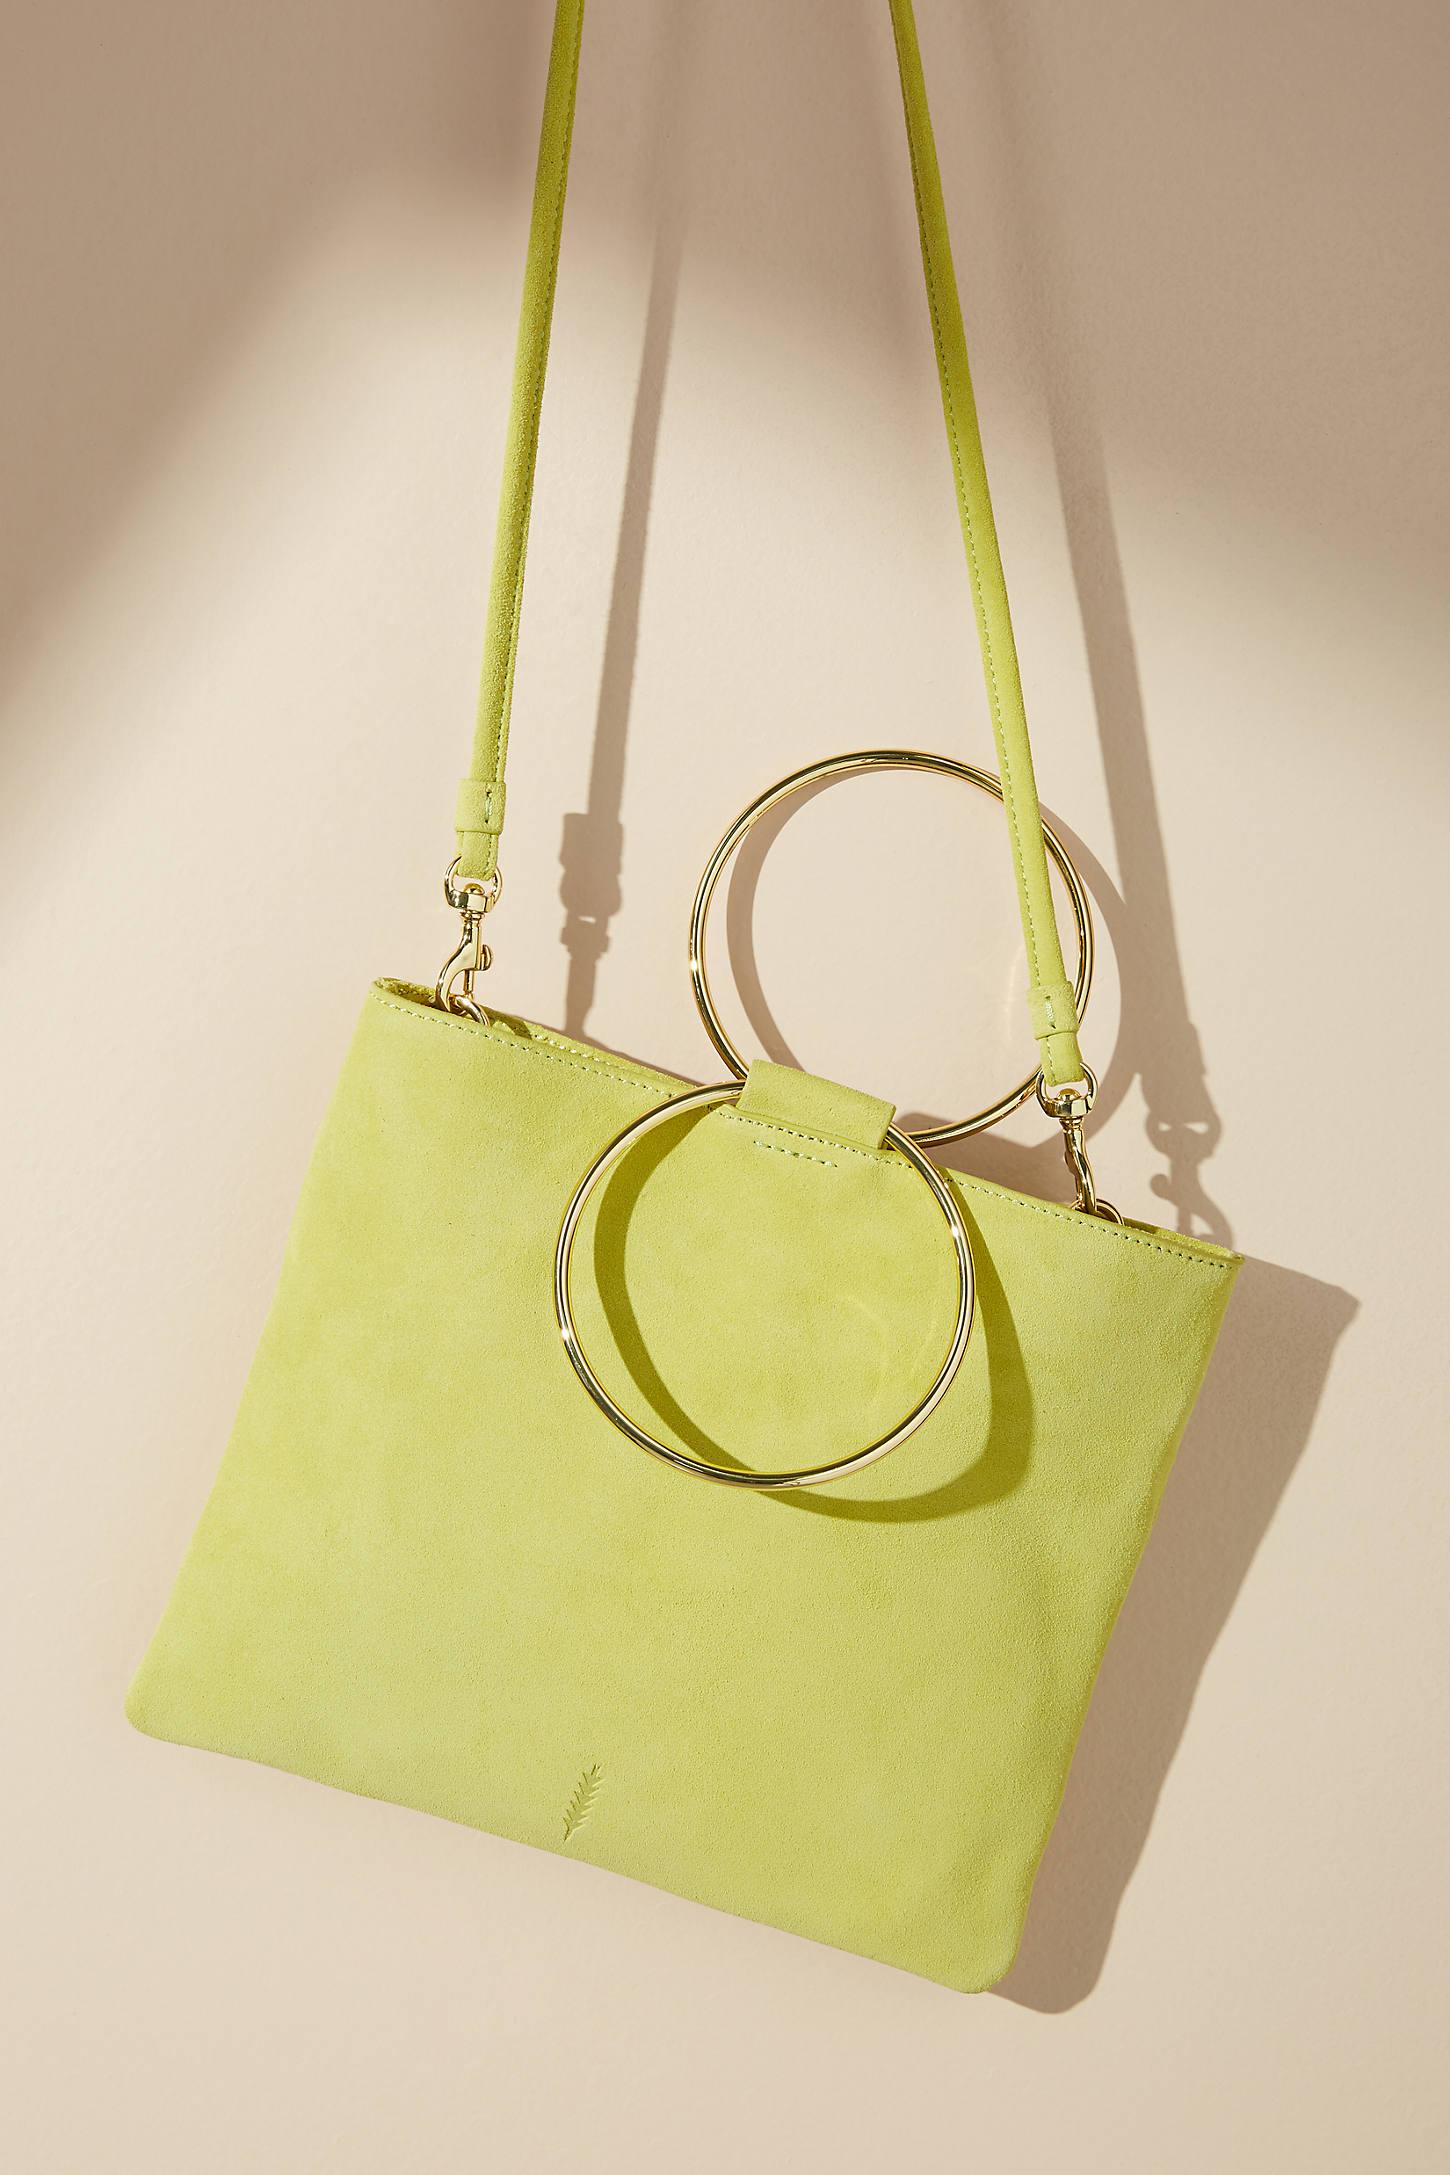 Le Pouch Crossbody Bag